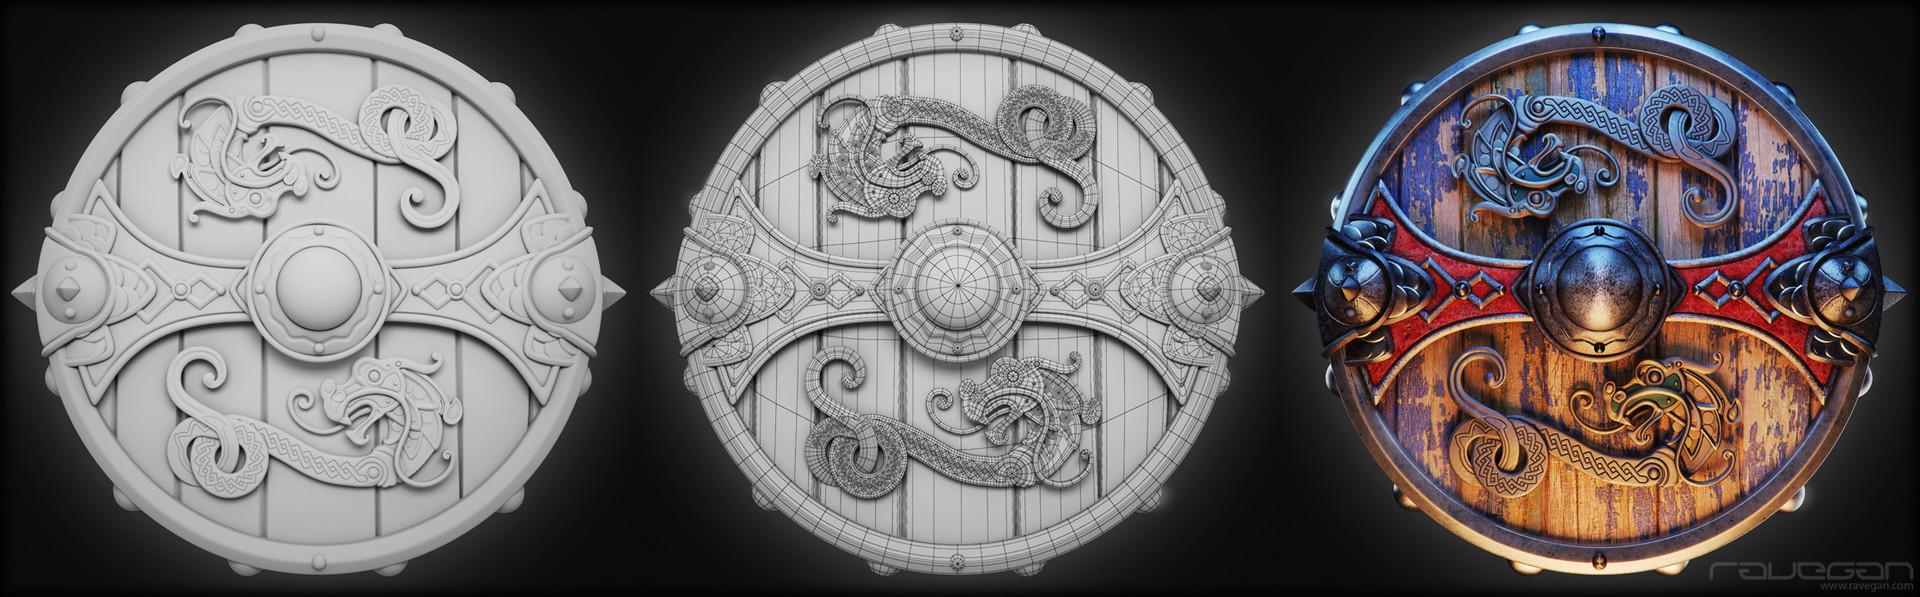 Ravegan games viking 13 shield hd